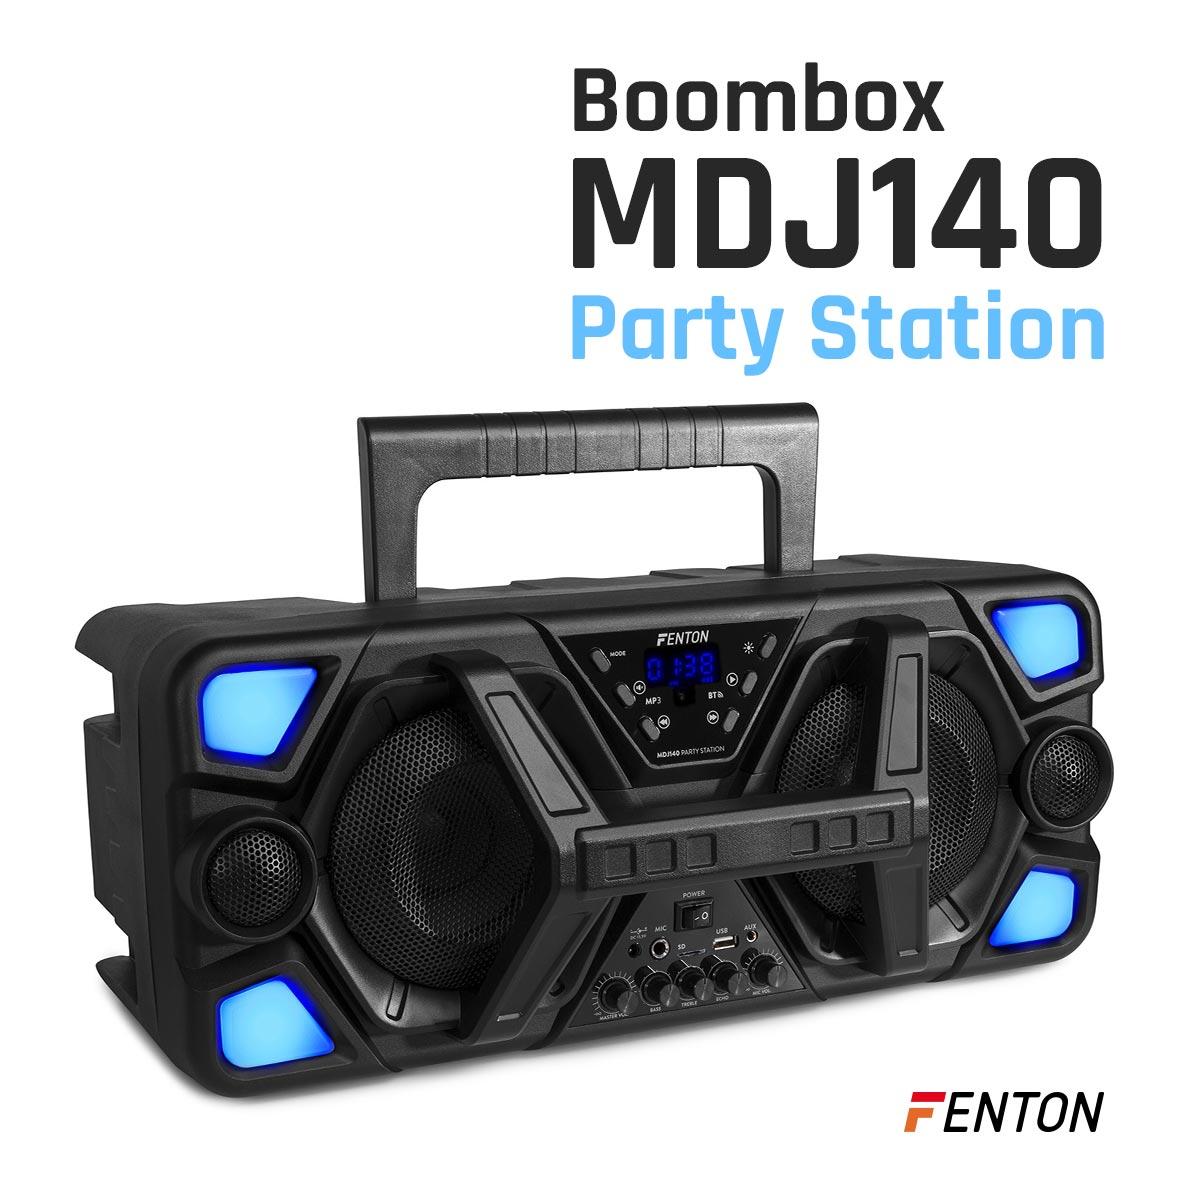 Boombox MDJ140